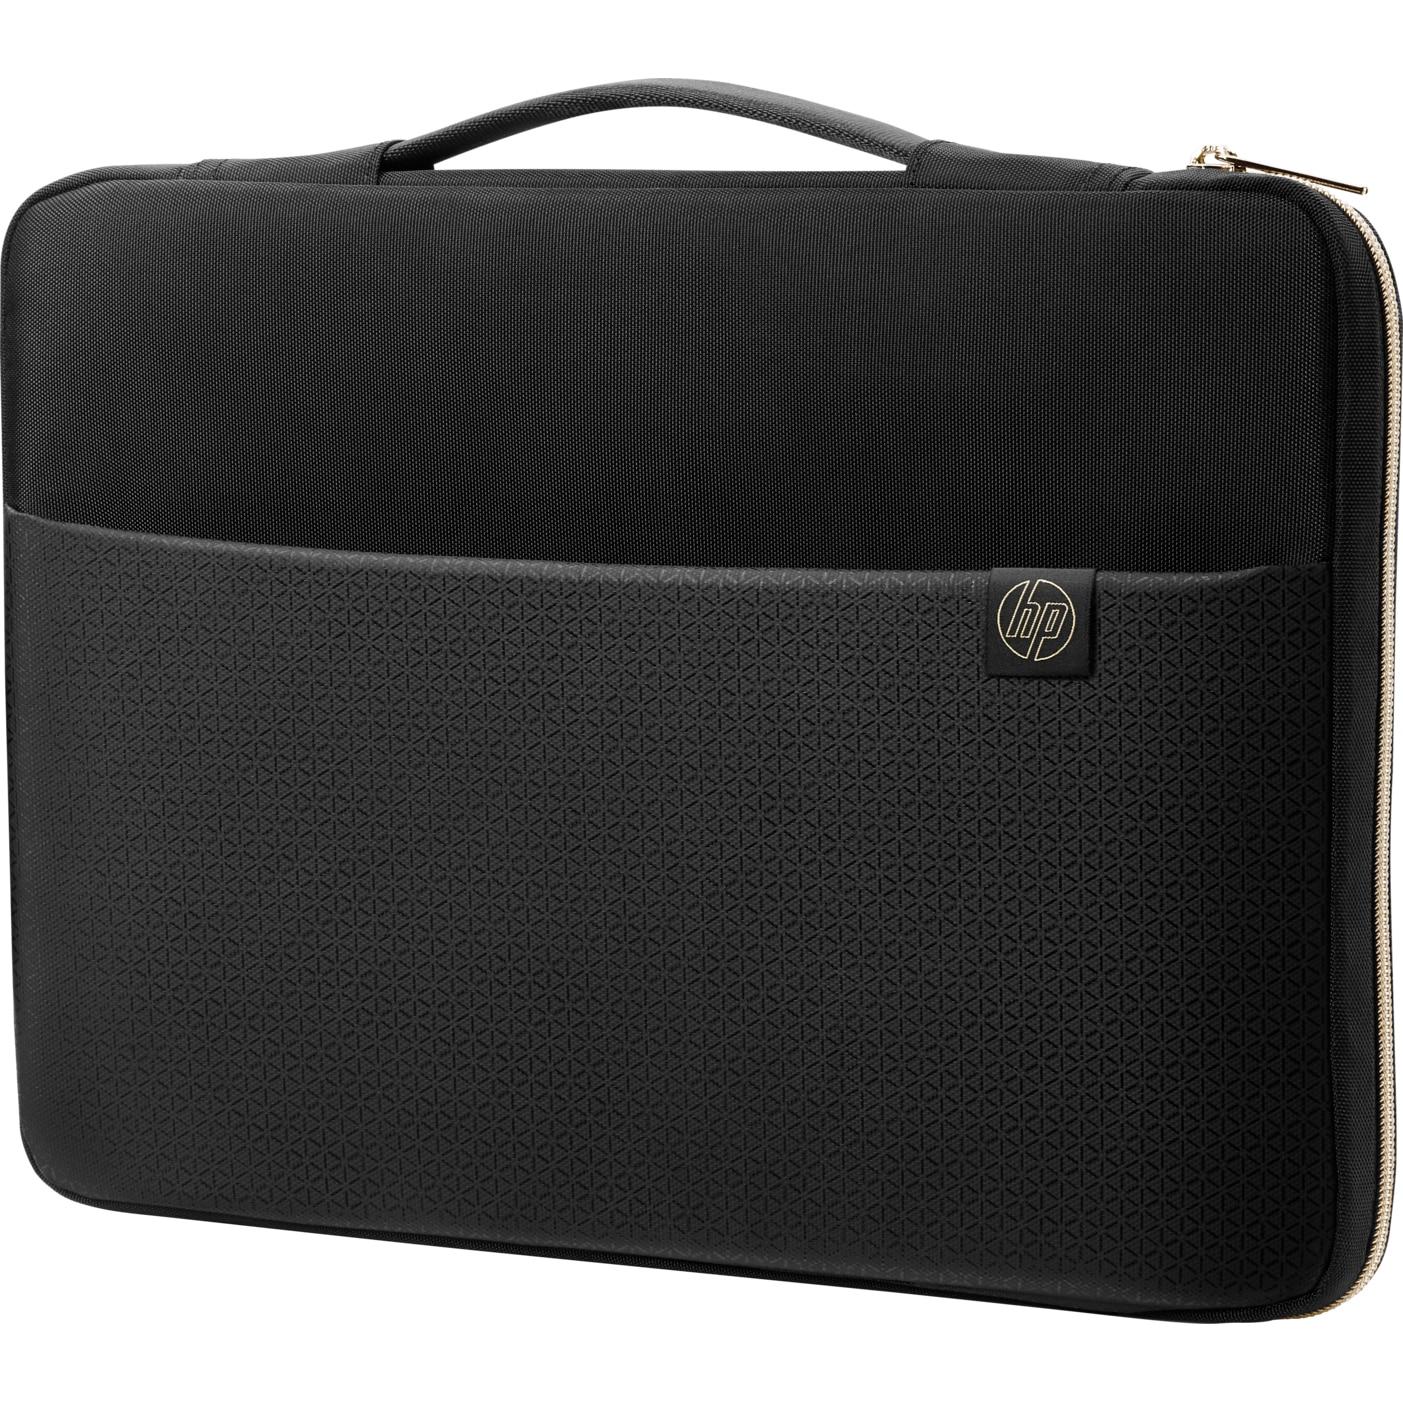 "Fotografie Husa laptop HP Carry Sleeve 14"", Negru/Auriu"